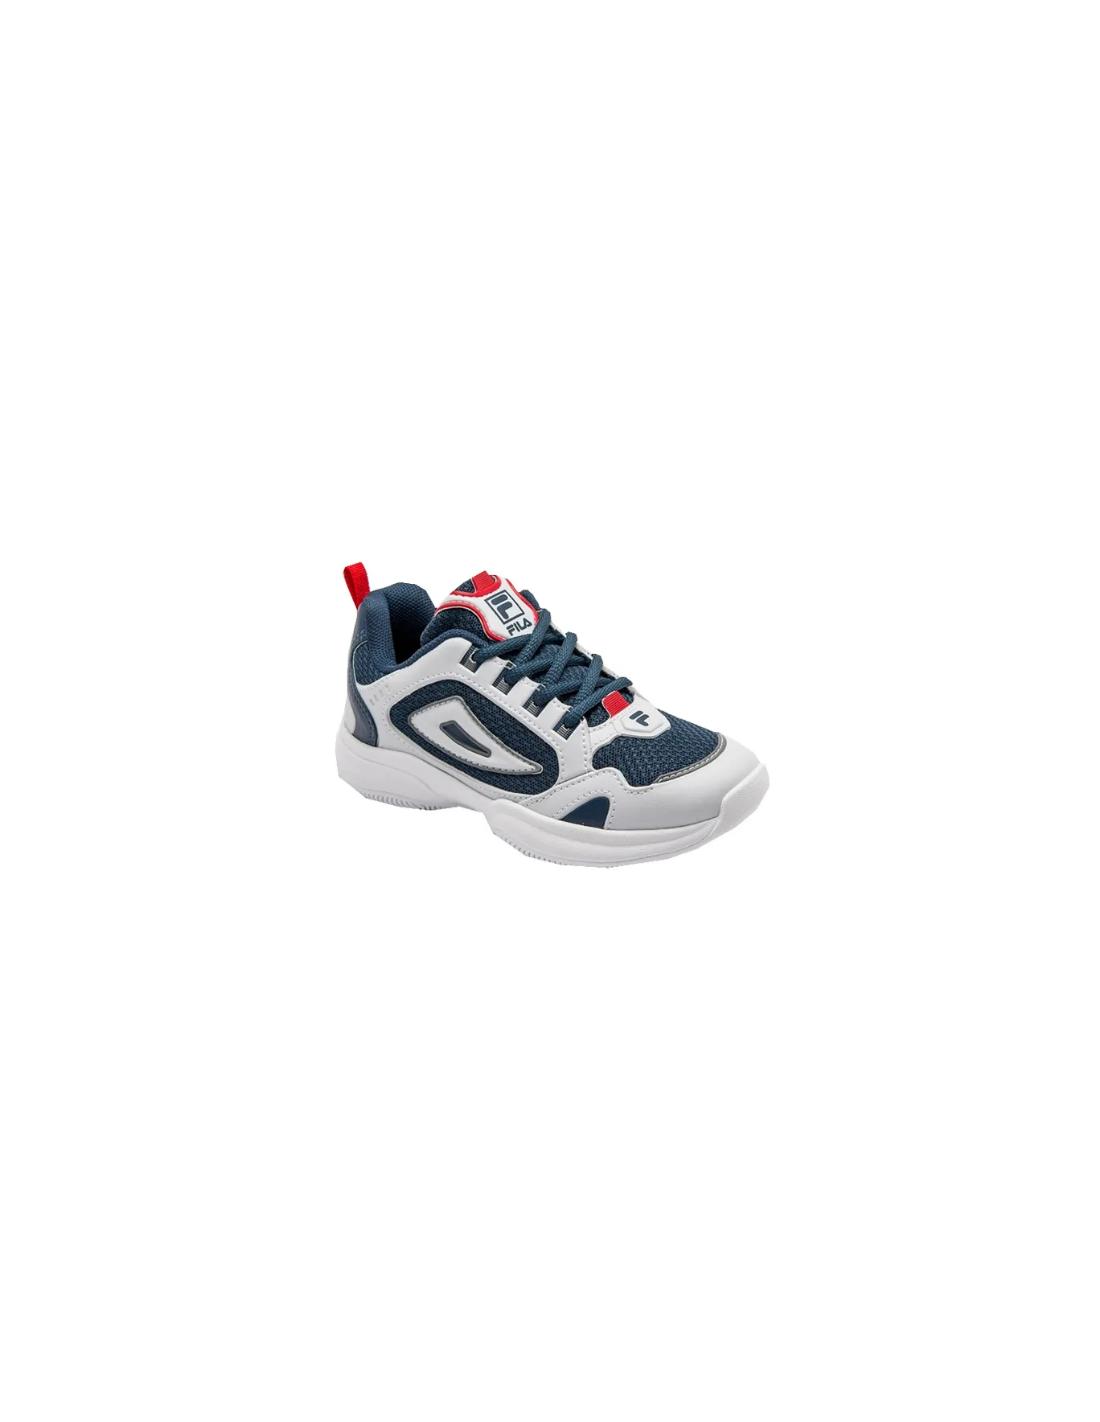 Zapatilla Fila Junior Attrek Blanco  Azul 877607